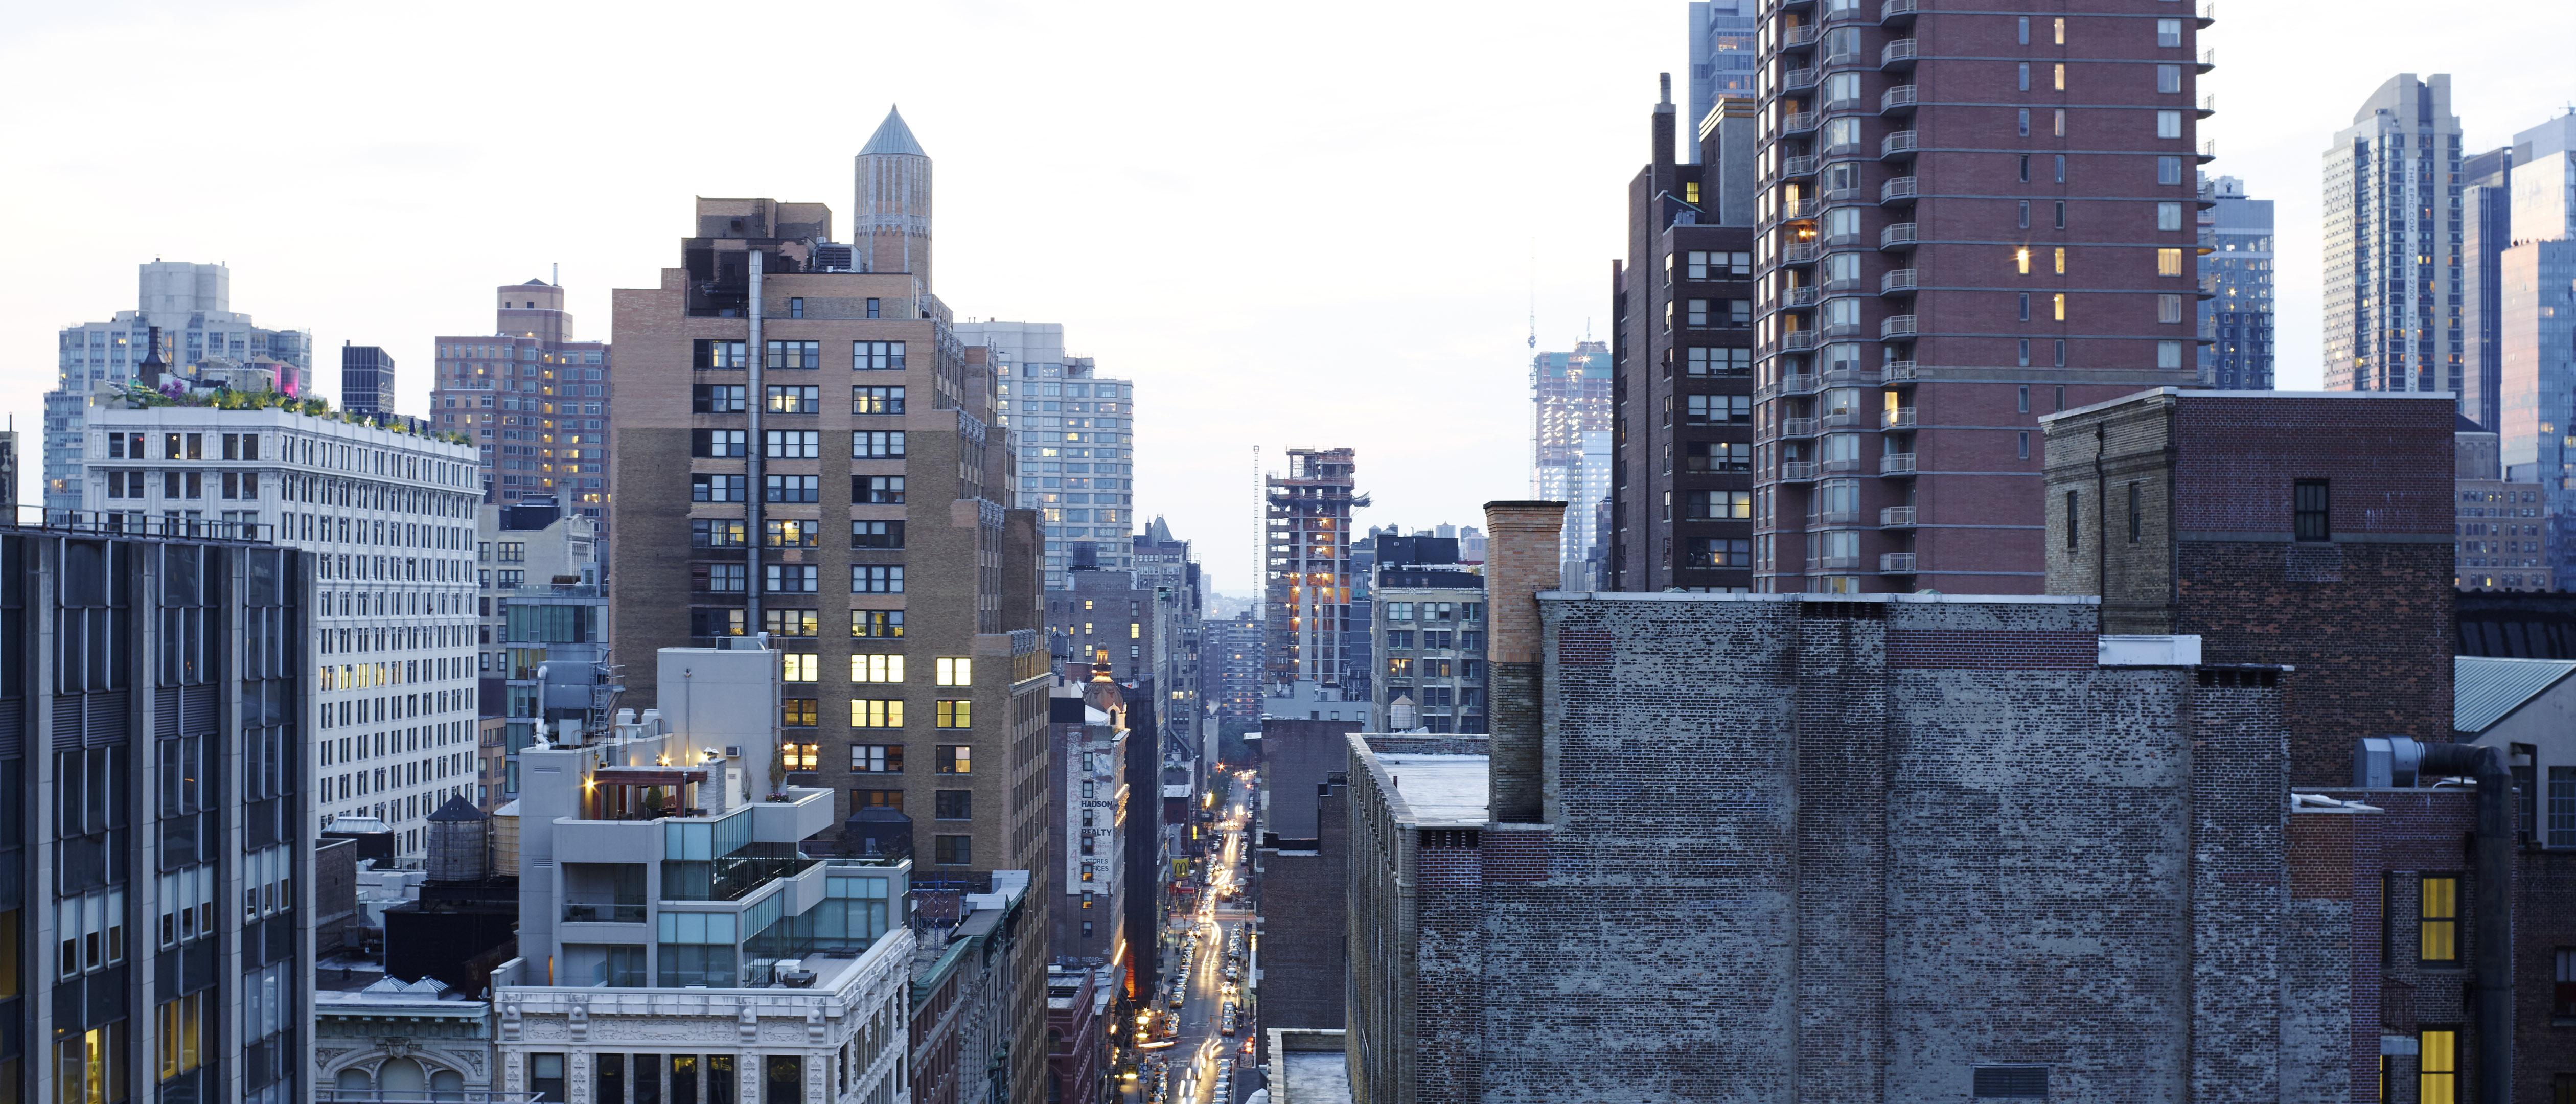 Metropolitan penthouse in New York City